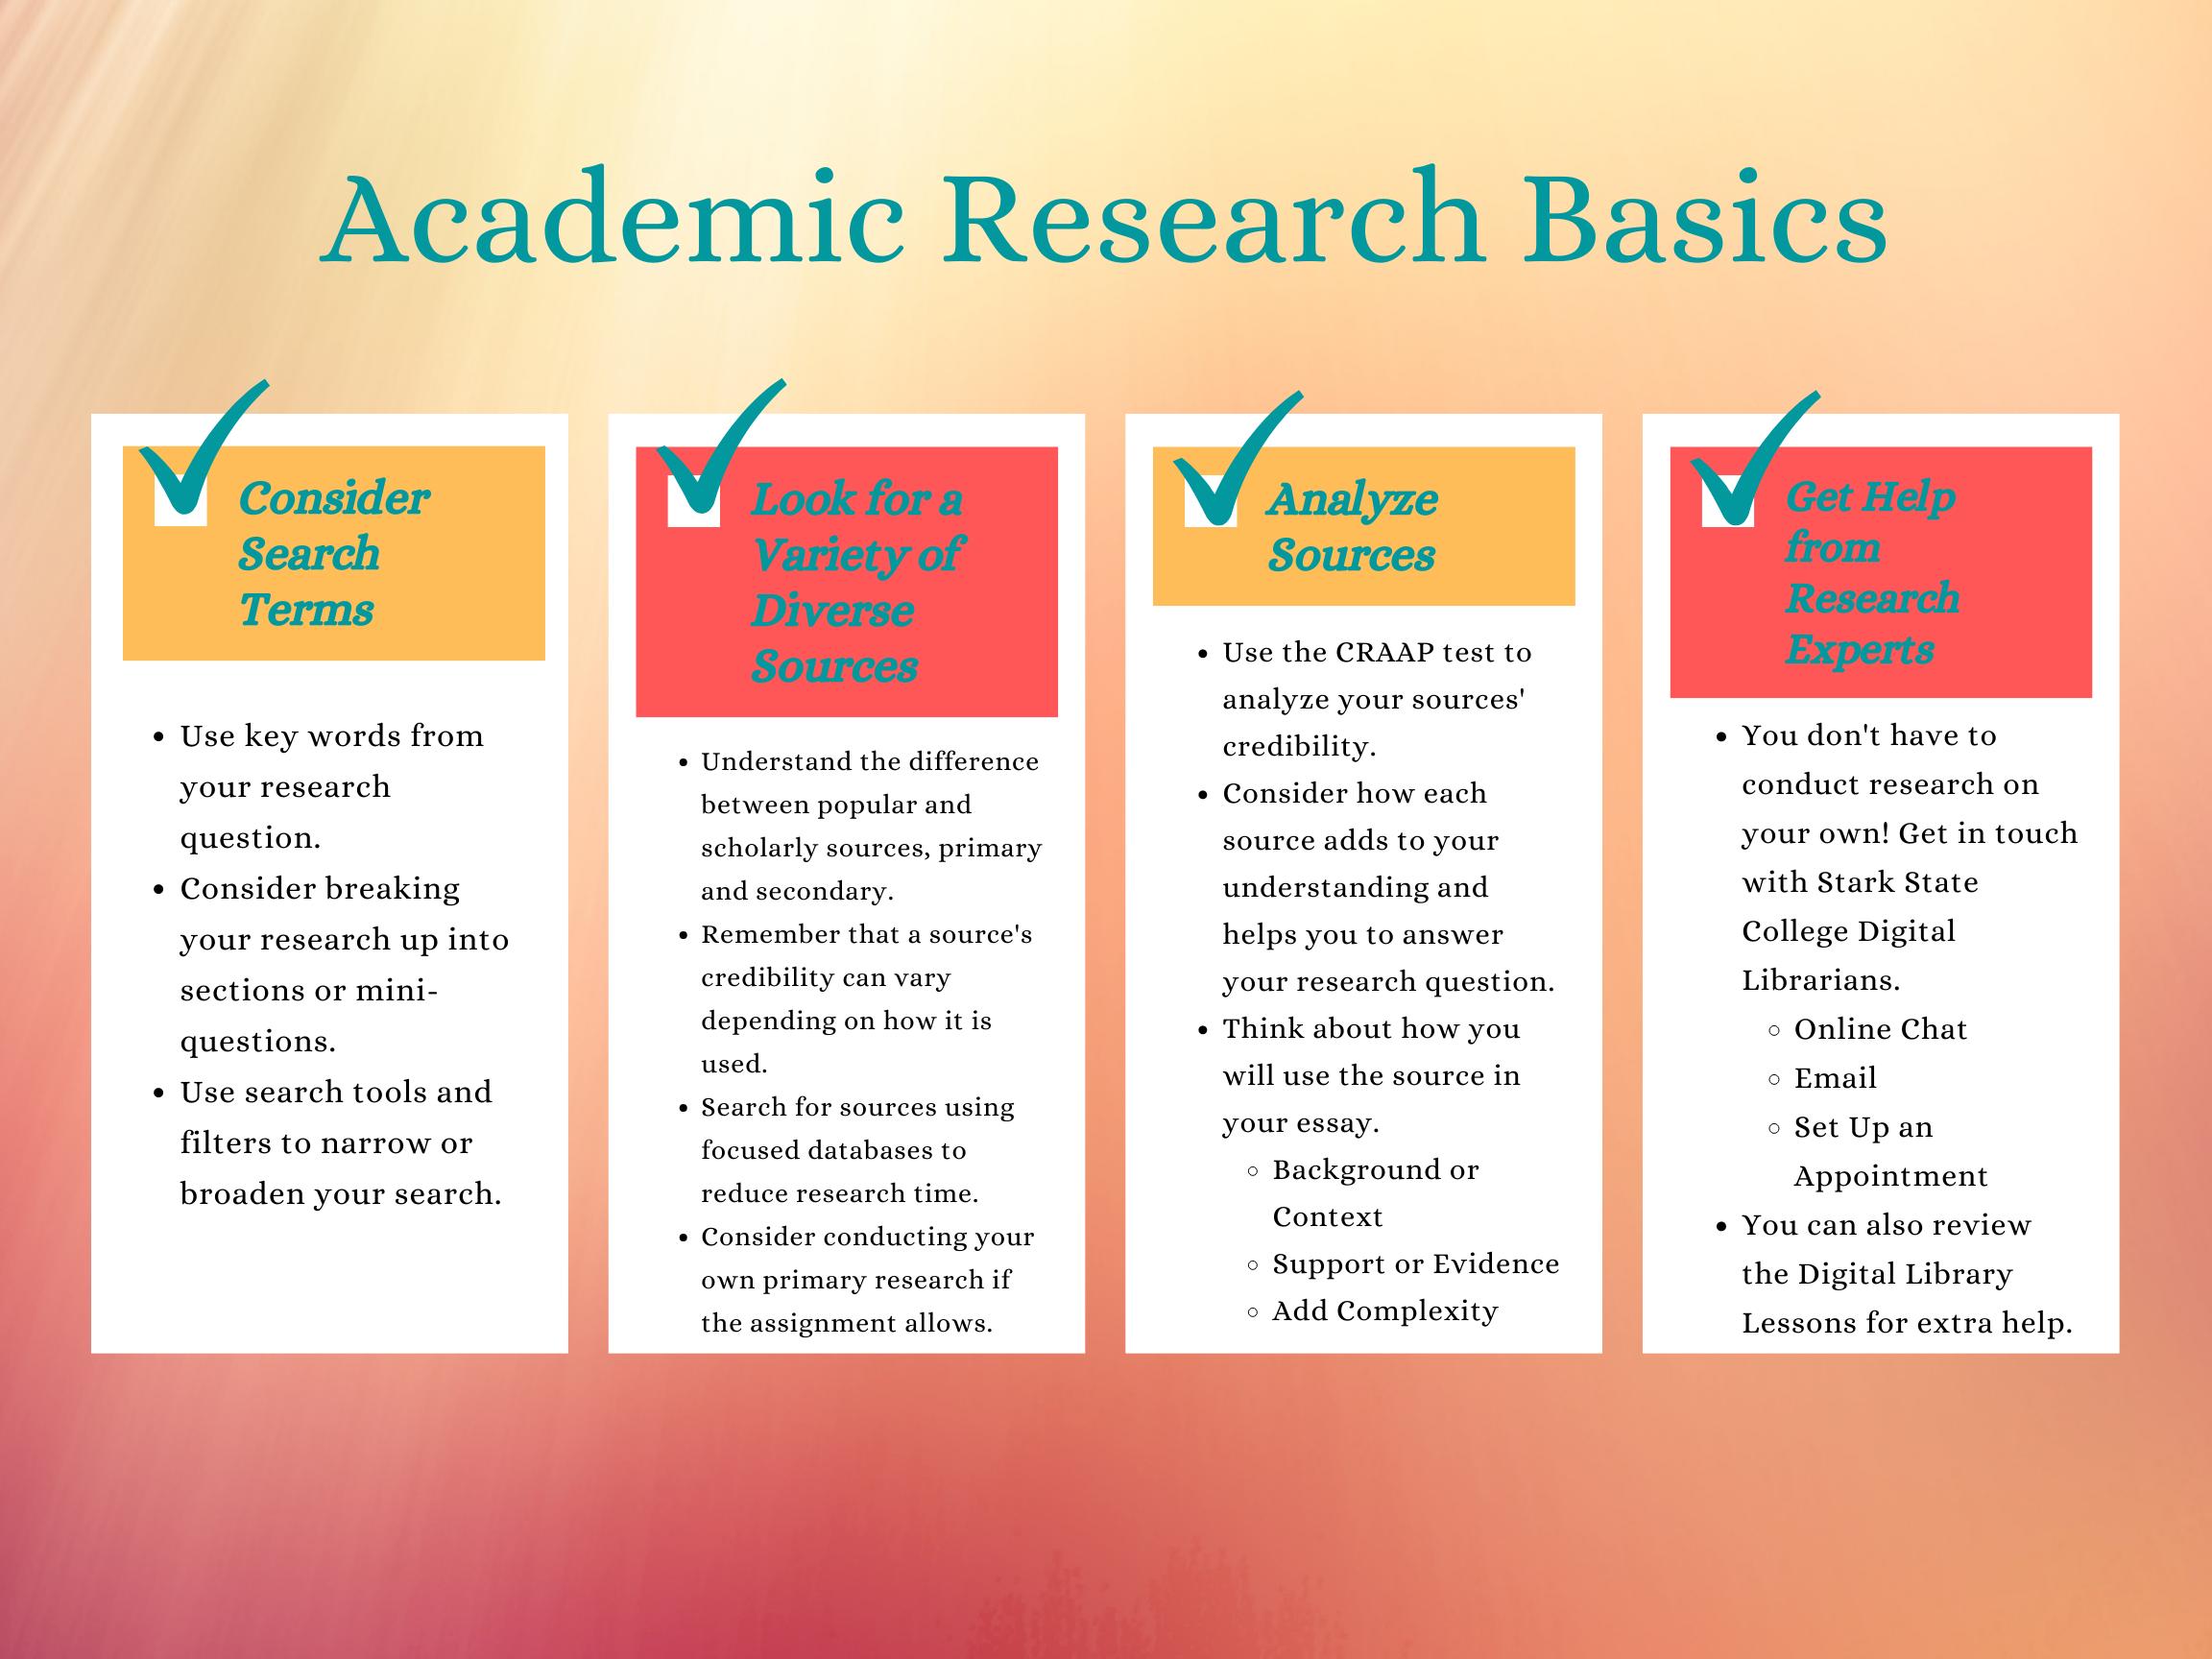 Academic Research Basics